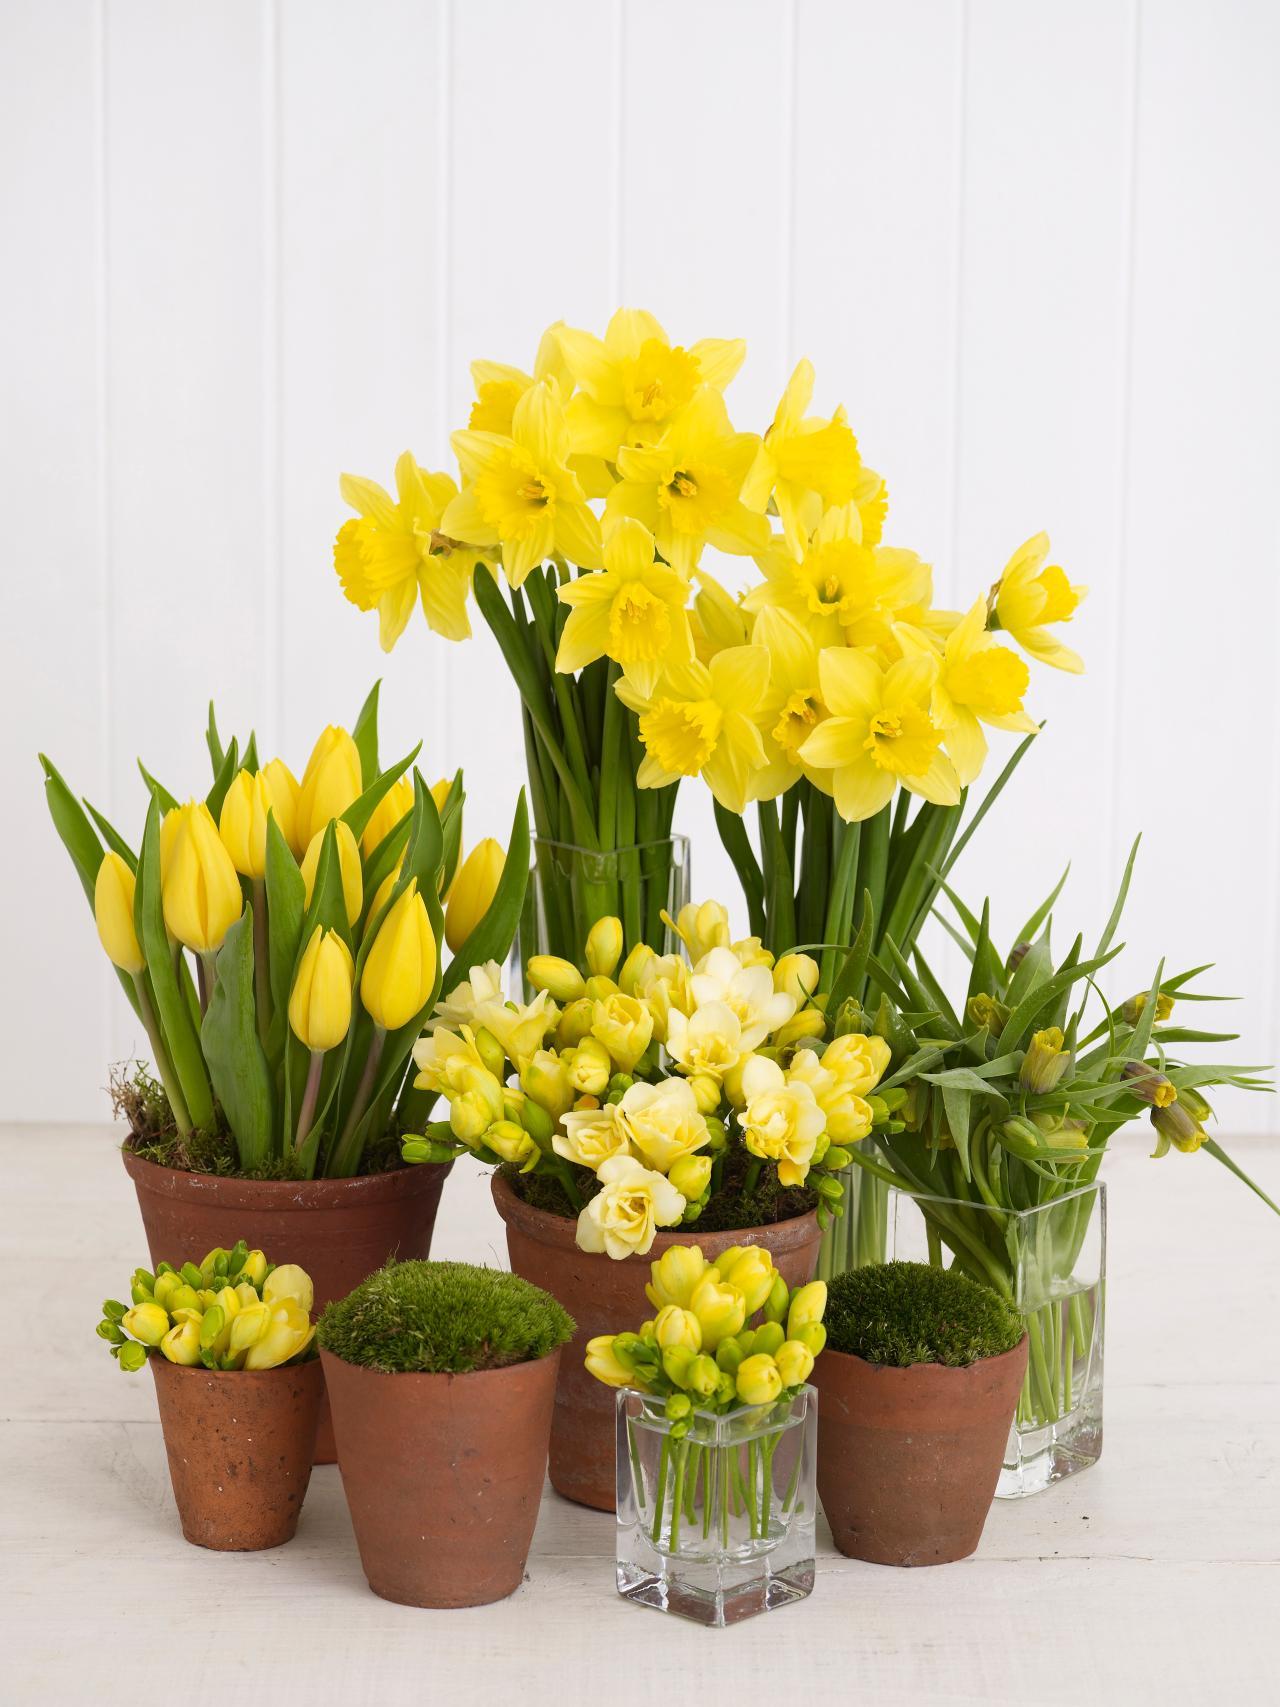 Spring Blooms | Revolving Decor